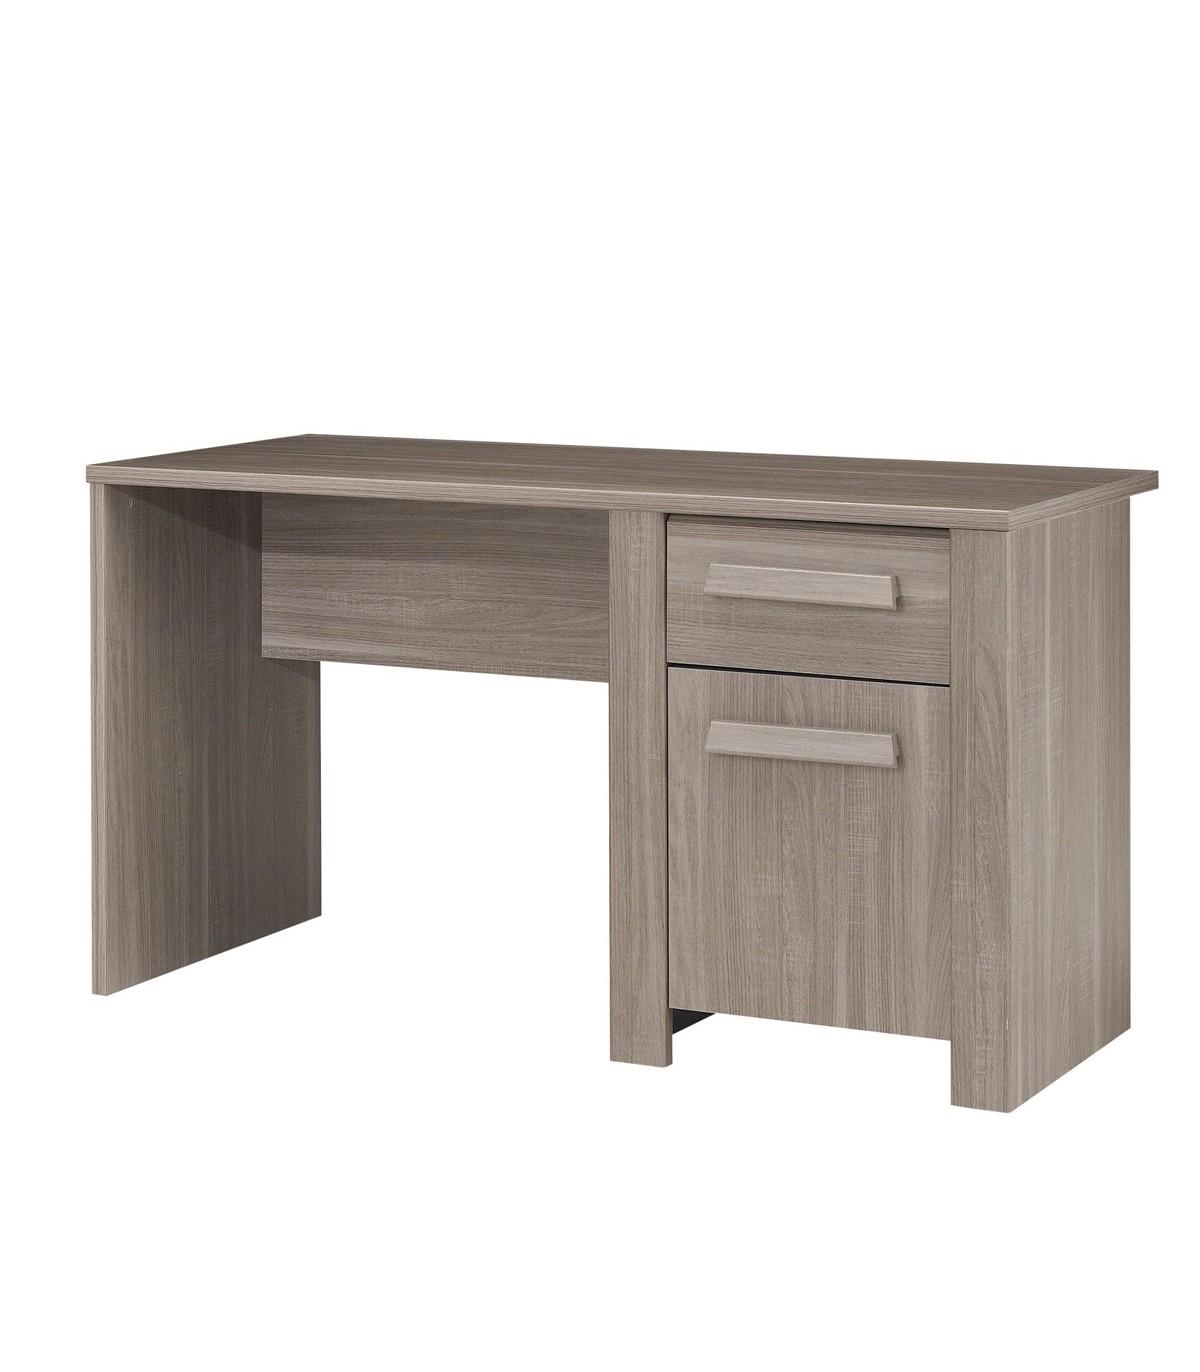 Bureau avec 1 porte et 1 tiroir - Marron